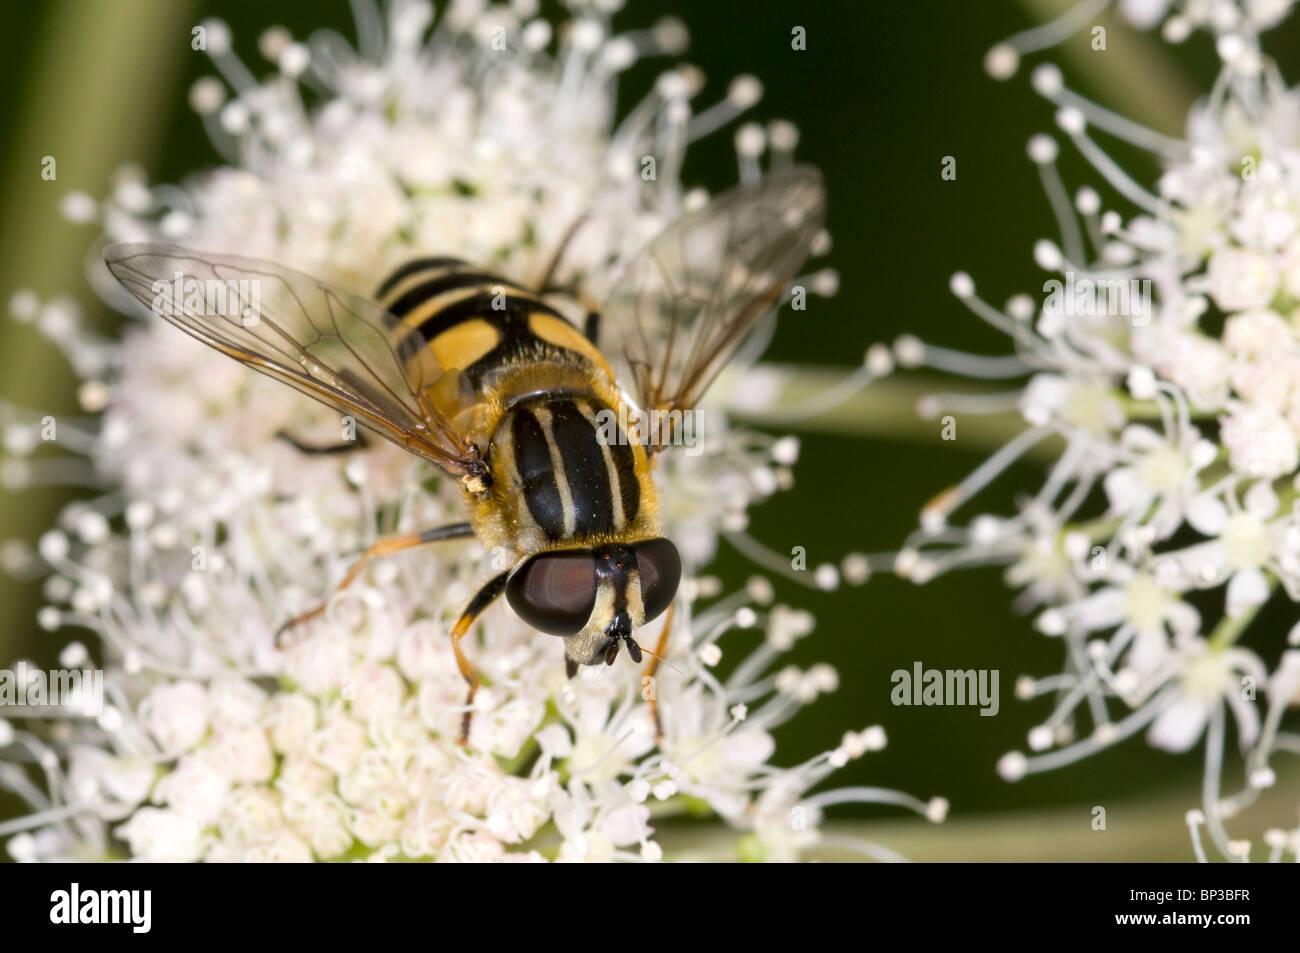 syrphid fly on meadowsweet (Filipendula ulmaria) feeding on nectar - Stock Image